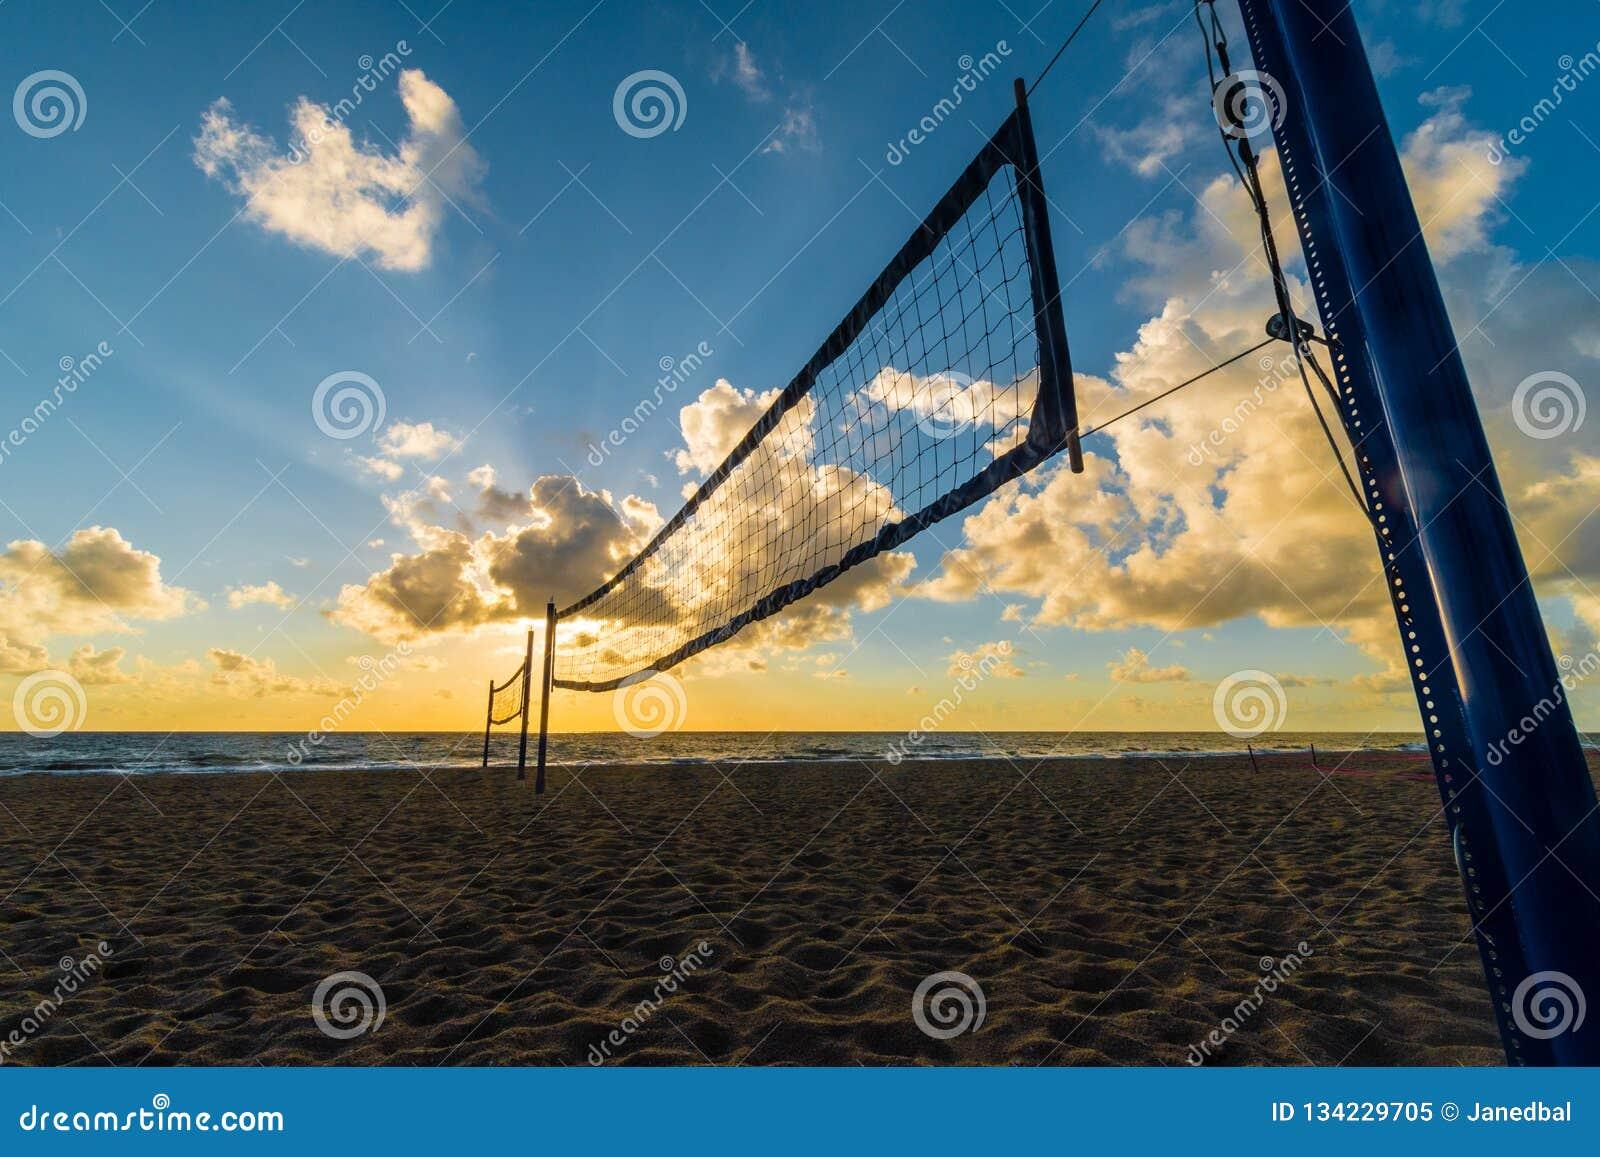 Strandvolleyballnetz bei Sonnenaufgang am Miami Beach, Florida, USA